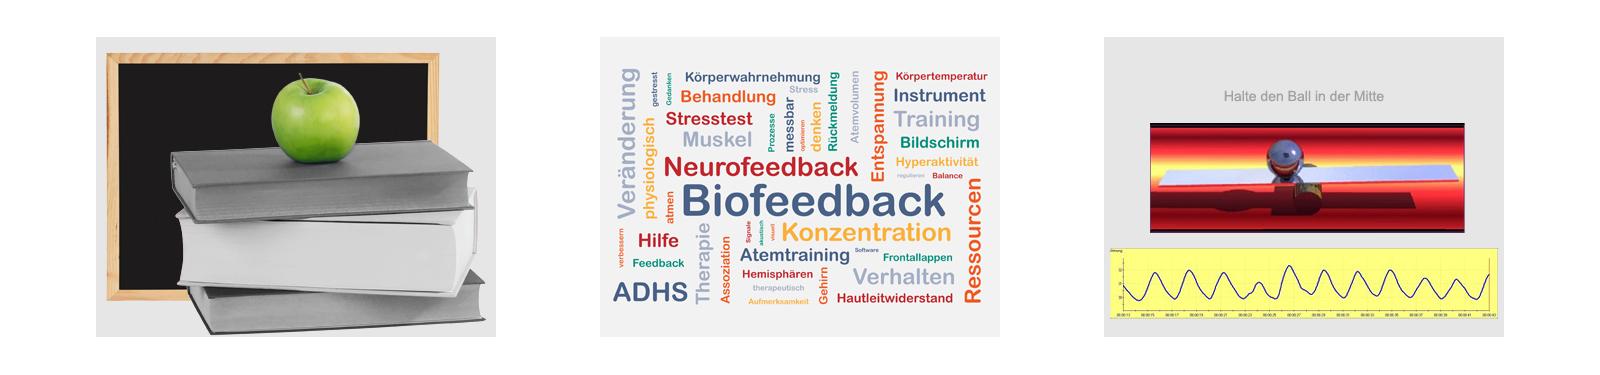 Körperwahrnehmungstraining - Biofeedback